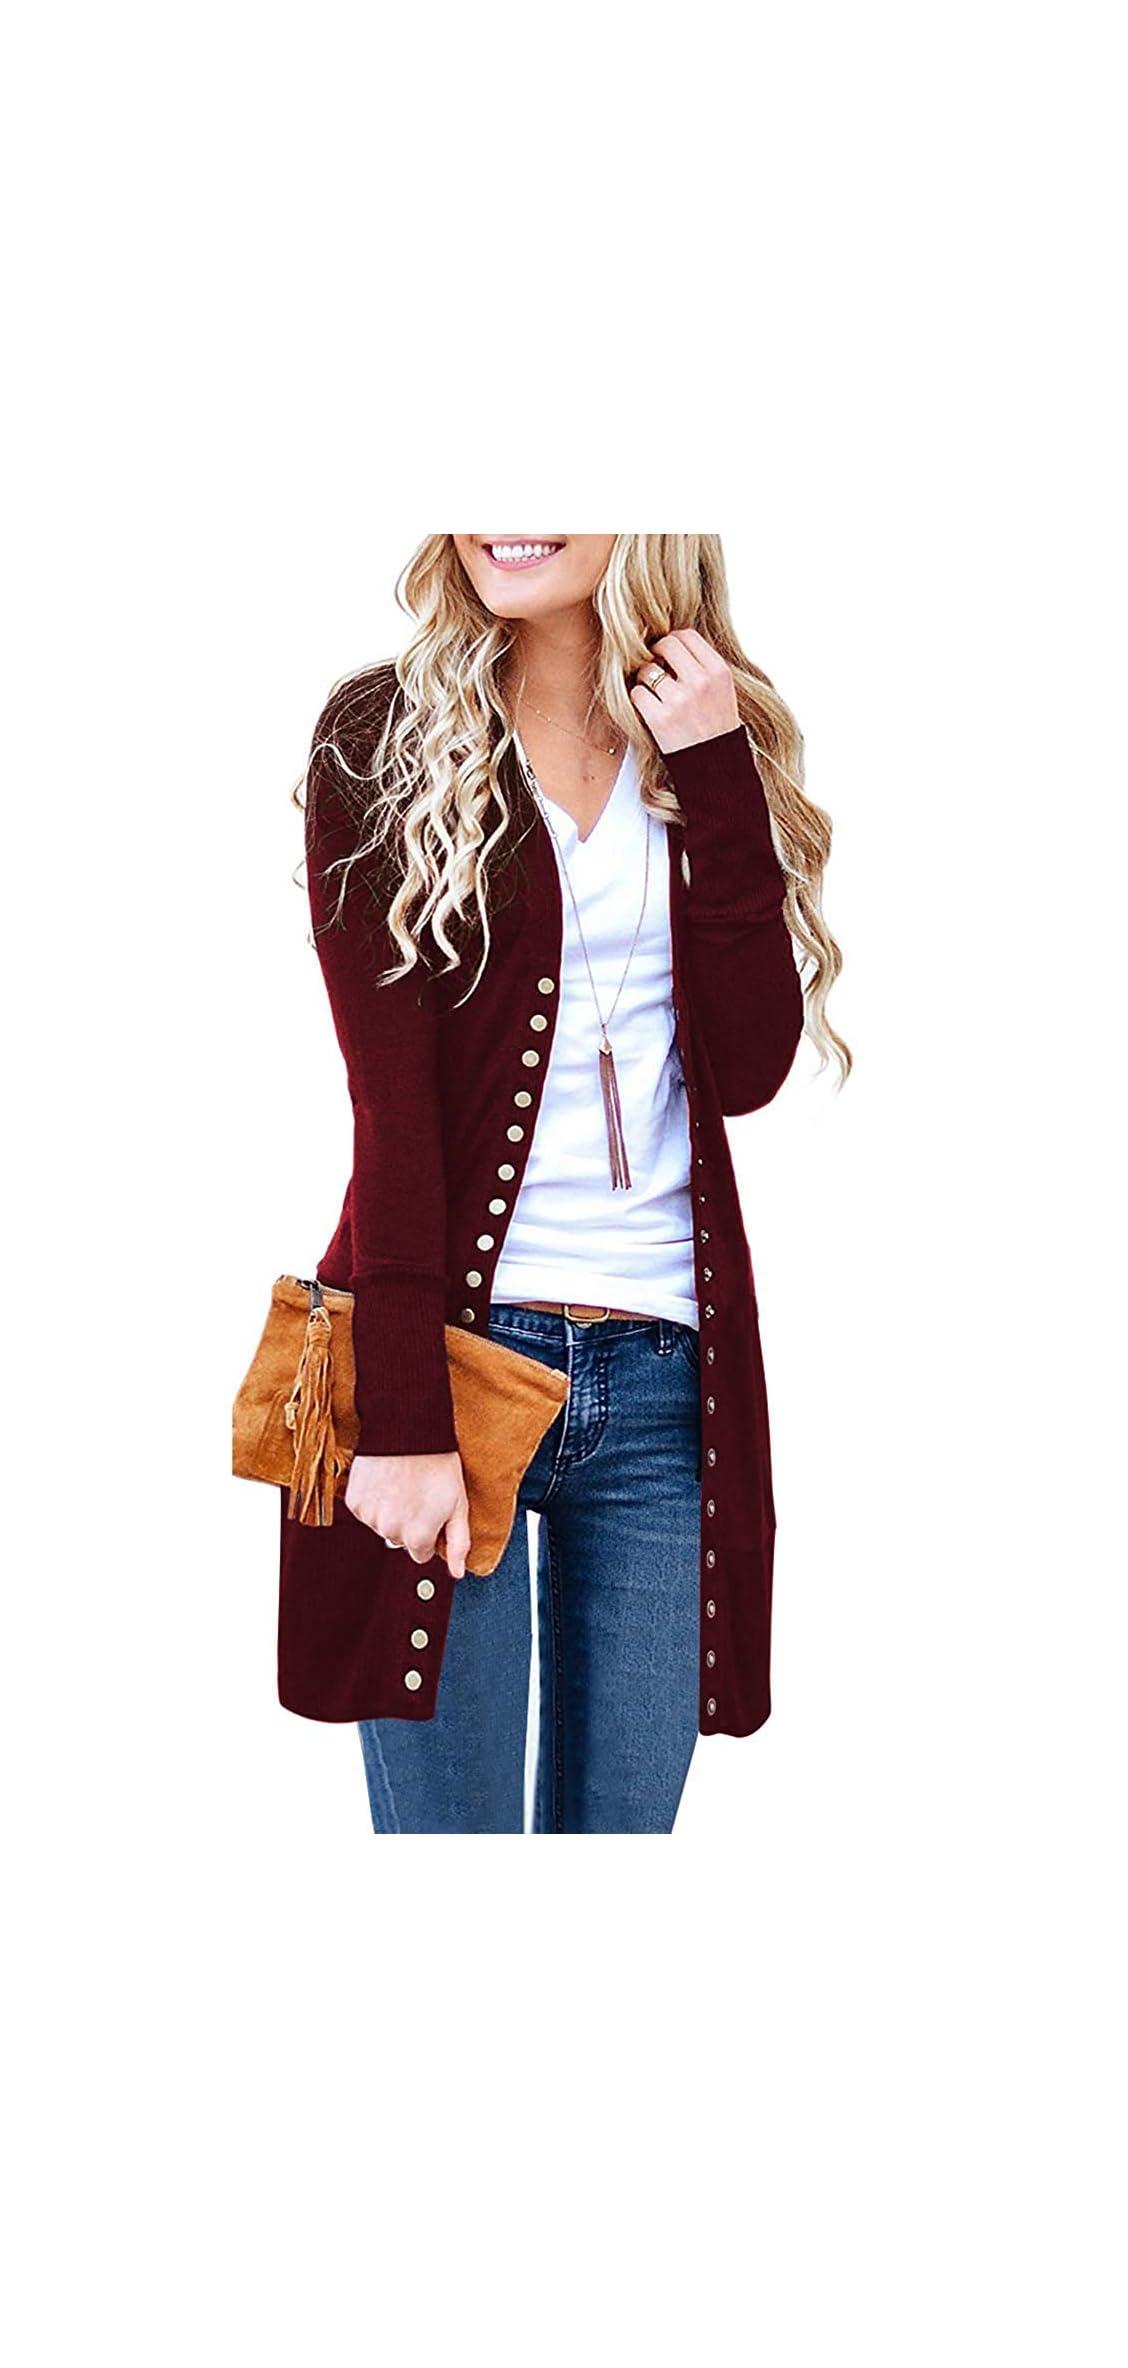 Women's S-xl V-neck Button Down Knitwear Long Soft